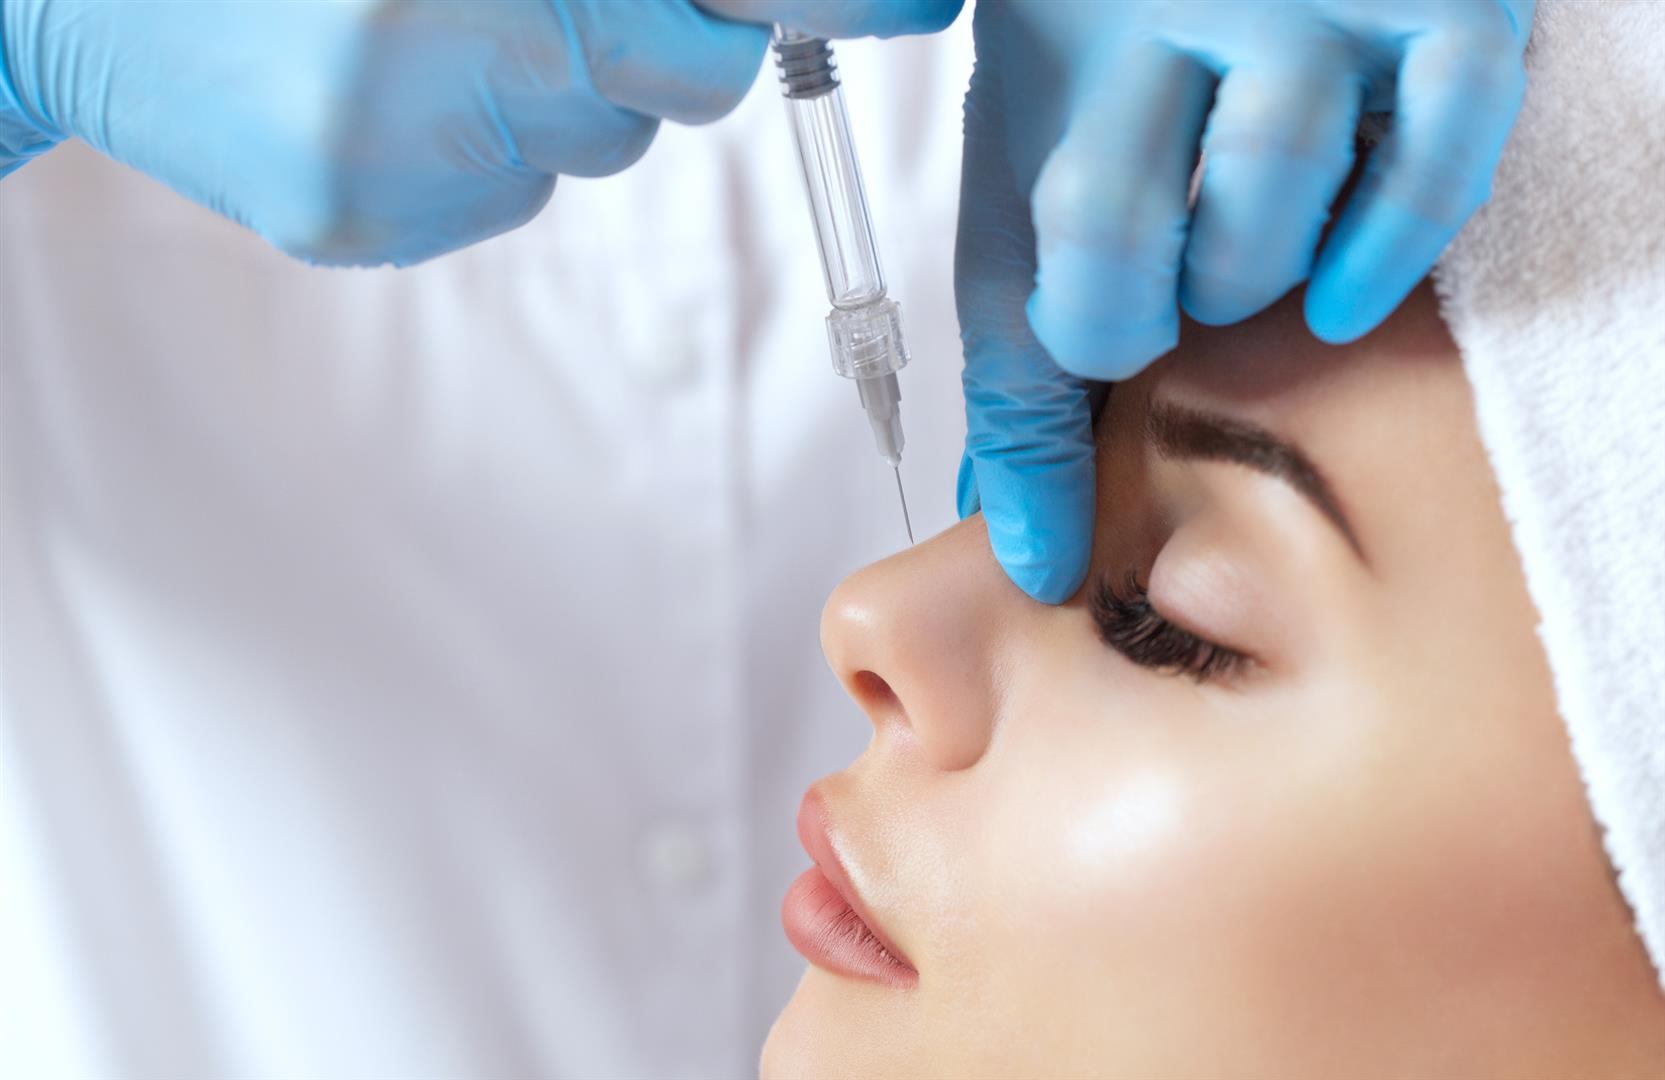 Nasenkorrektur ohne OP mit Filler